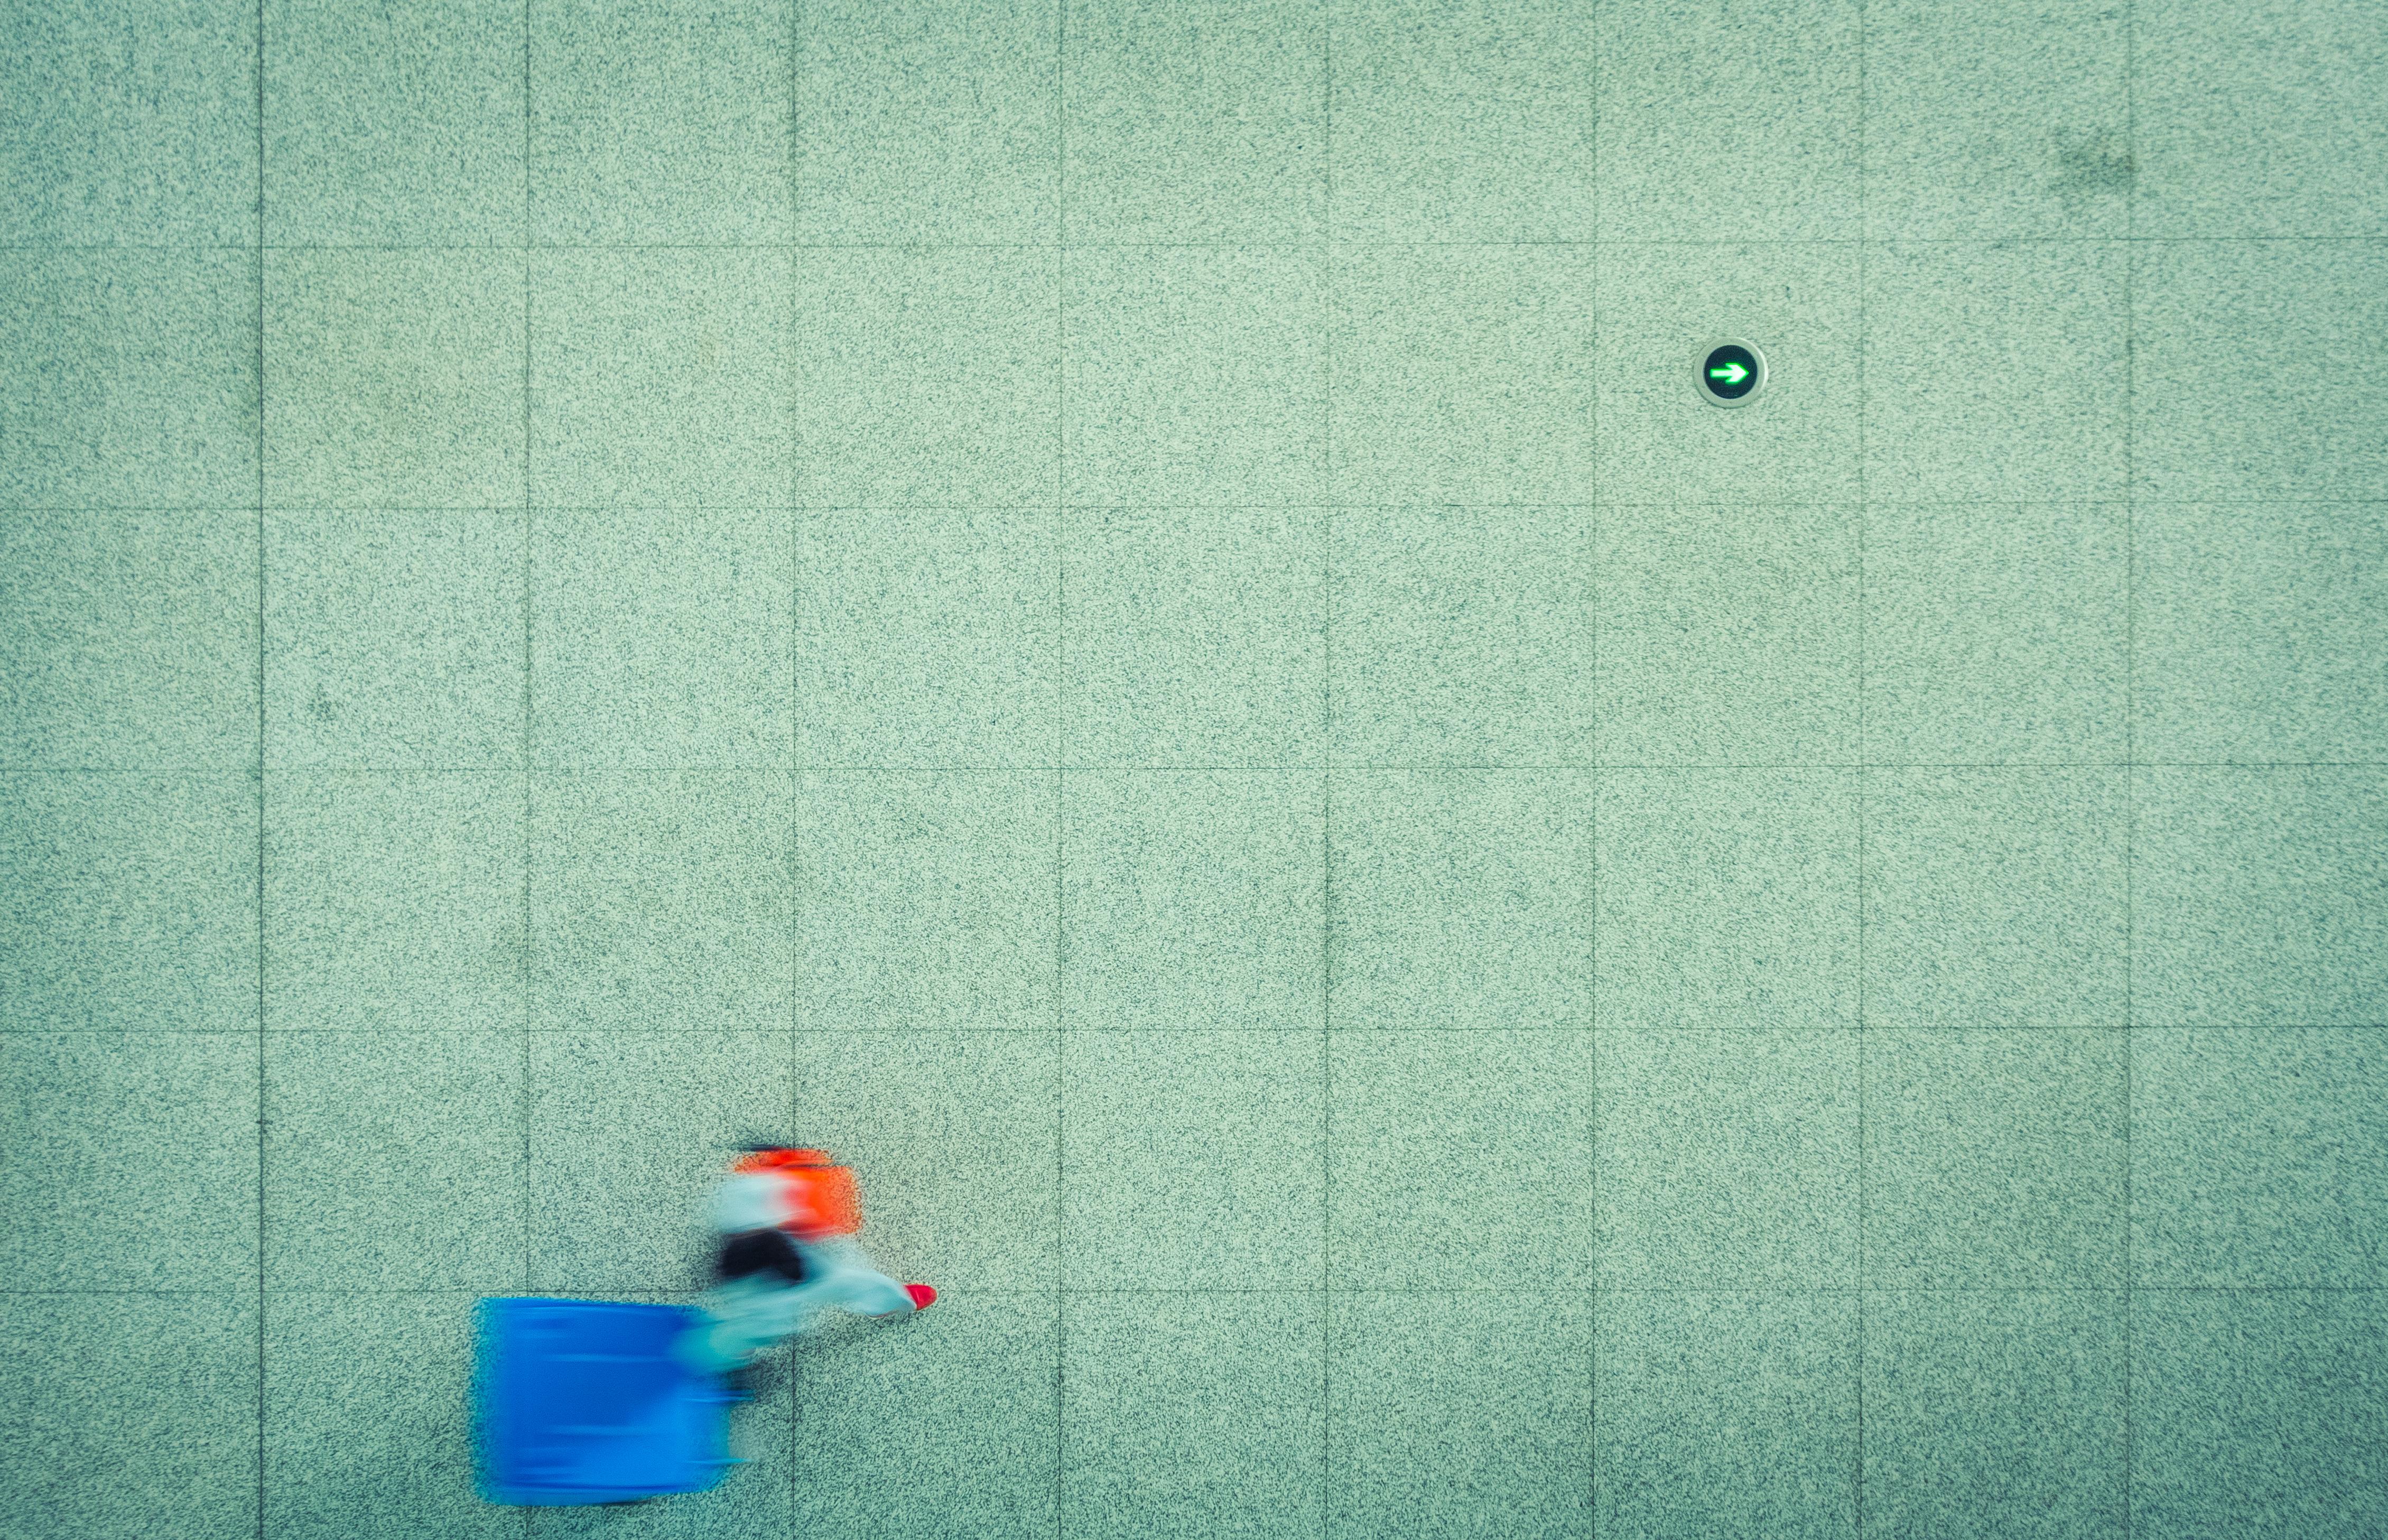 blur-street-photography-texture-glass-wa